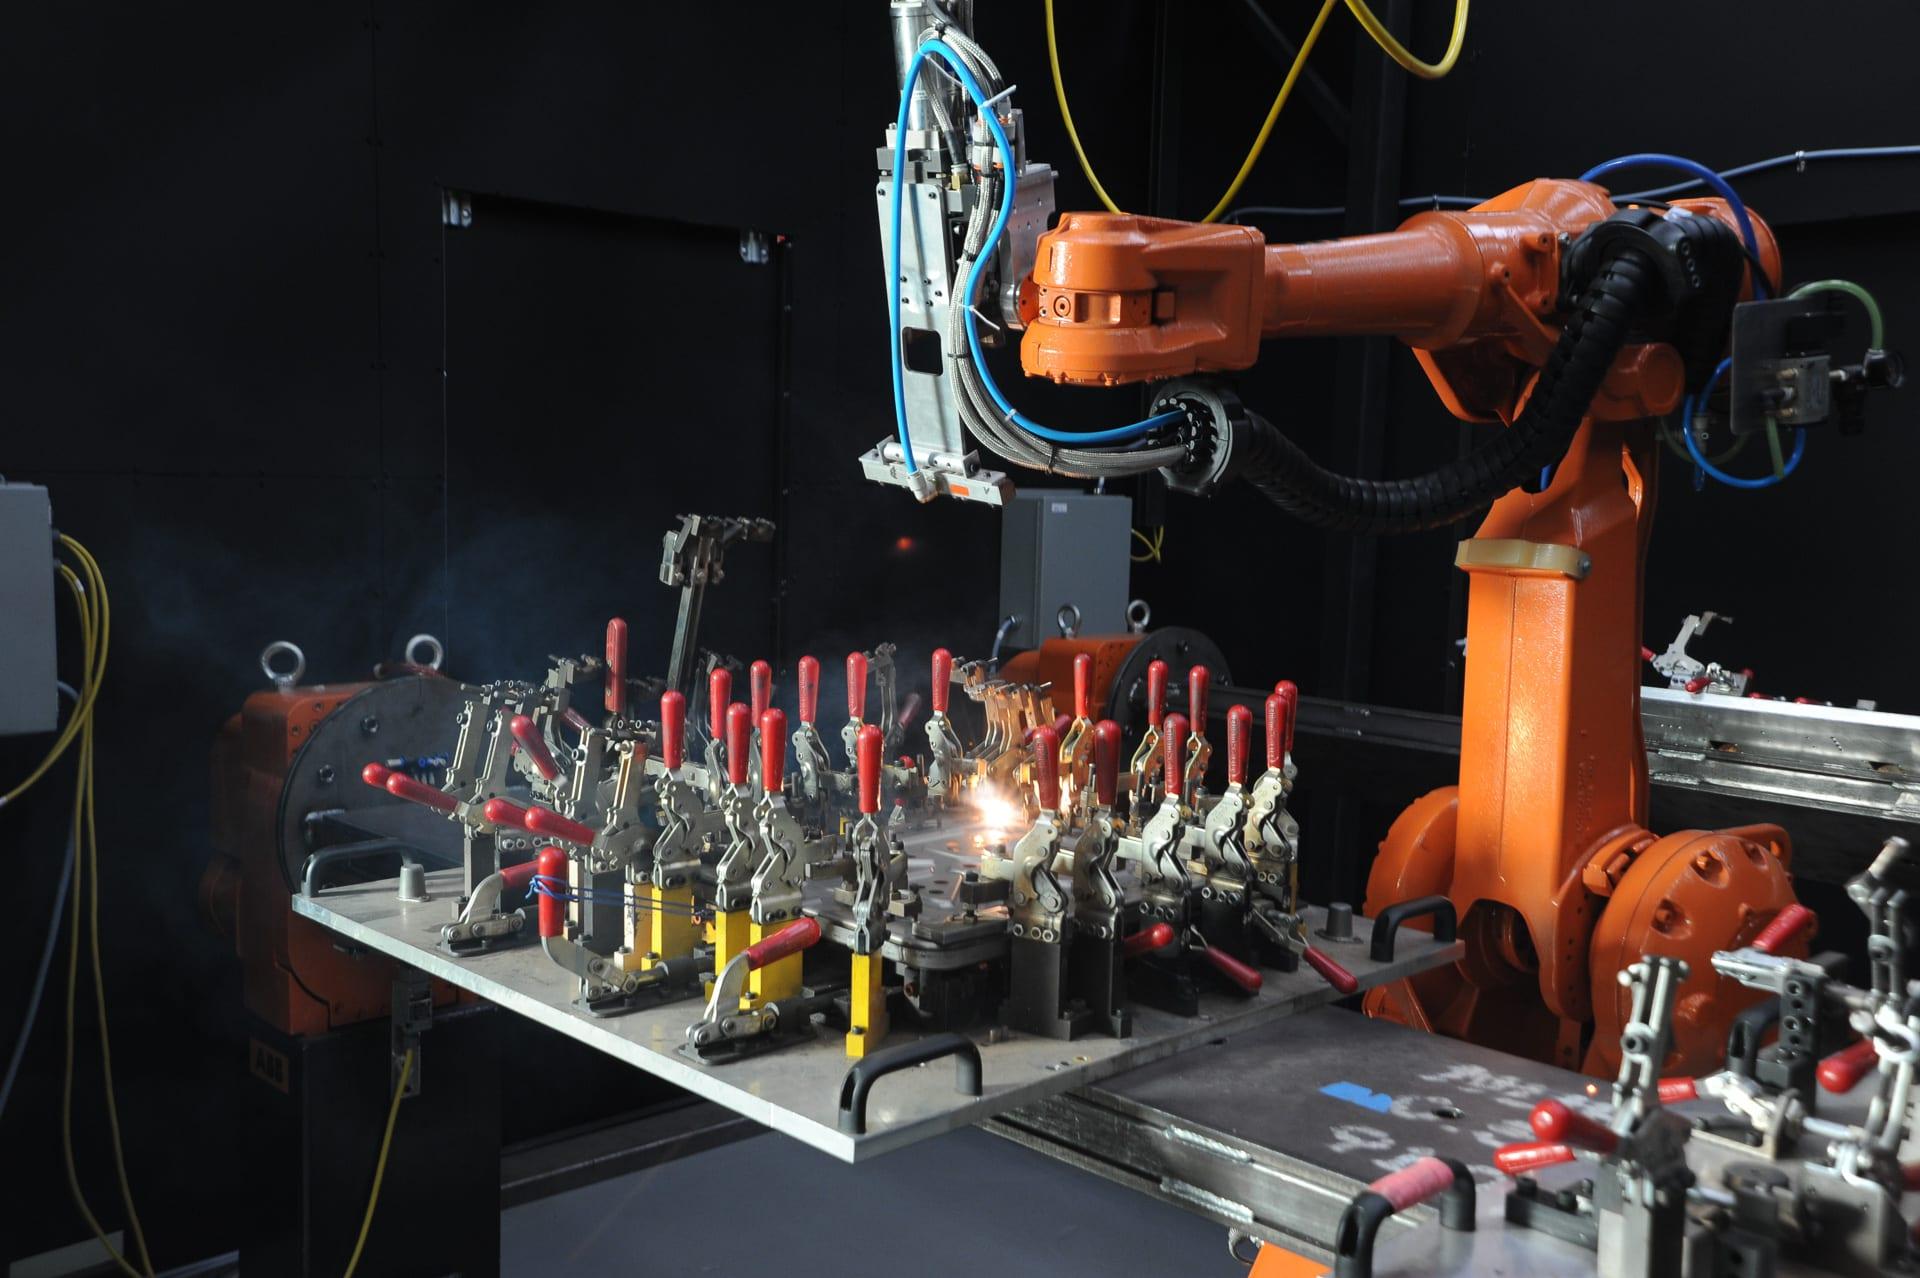 Multi-Axis Robot Laser Cutter